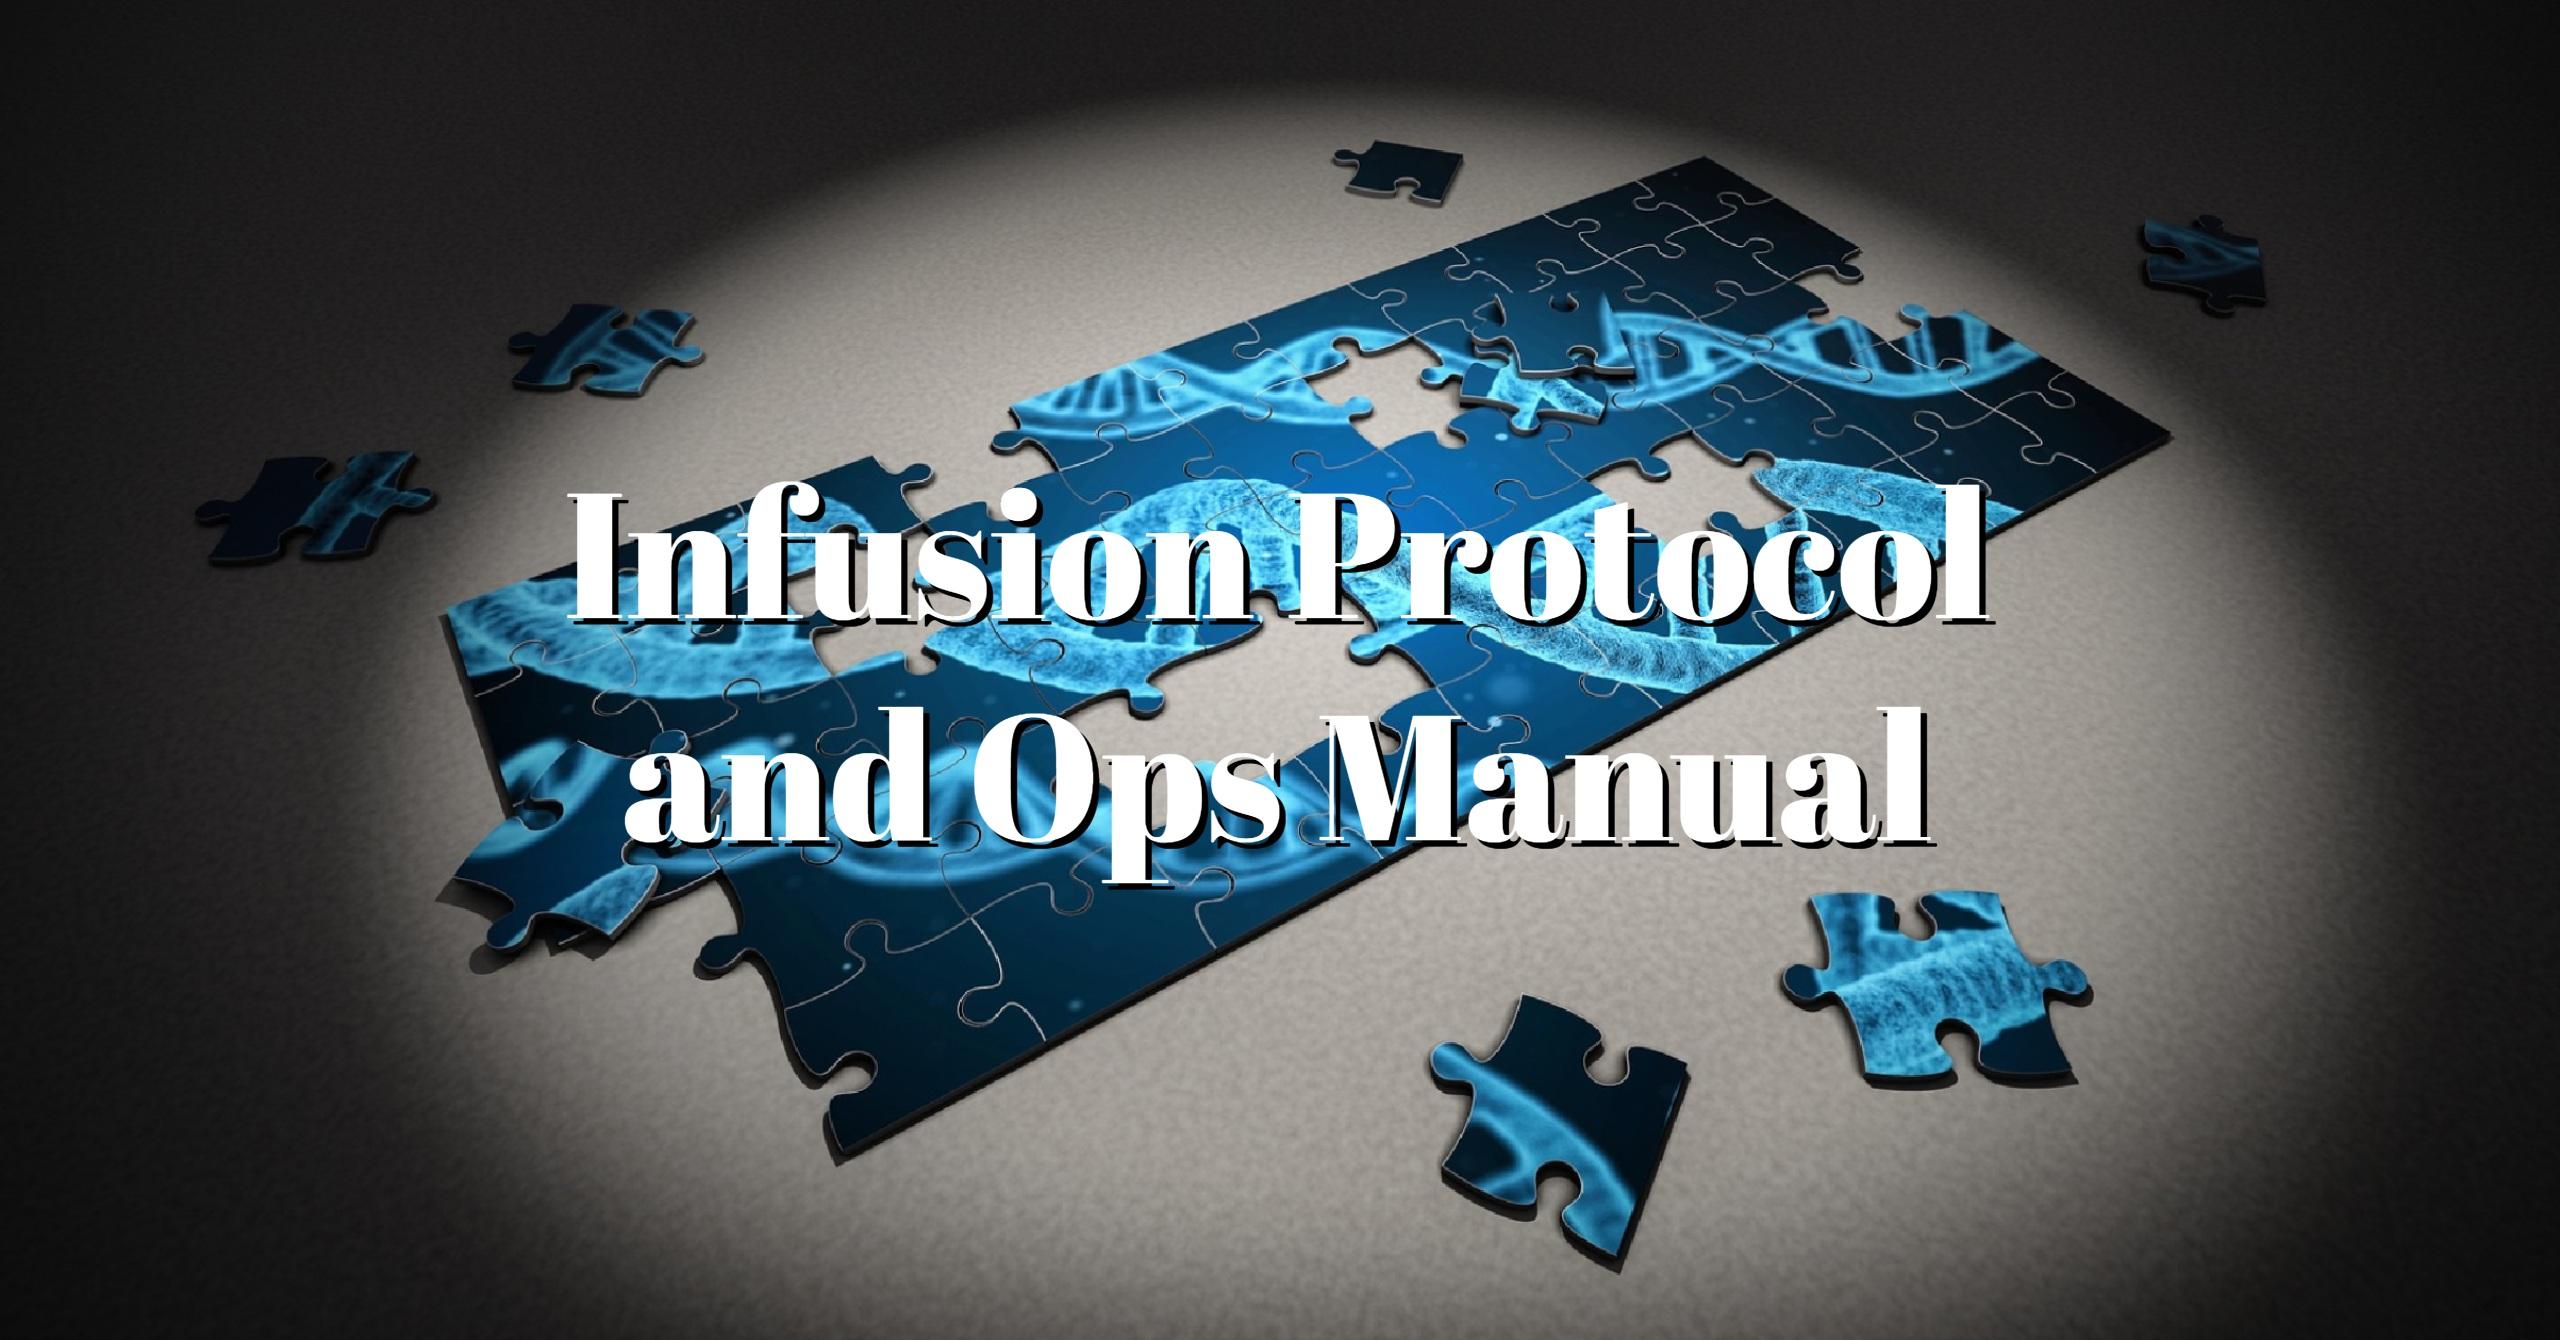 Ketamine Infusion Protocol and Operations Manual